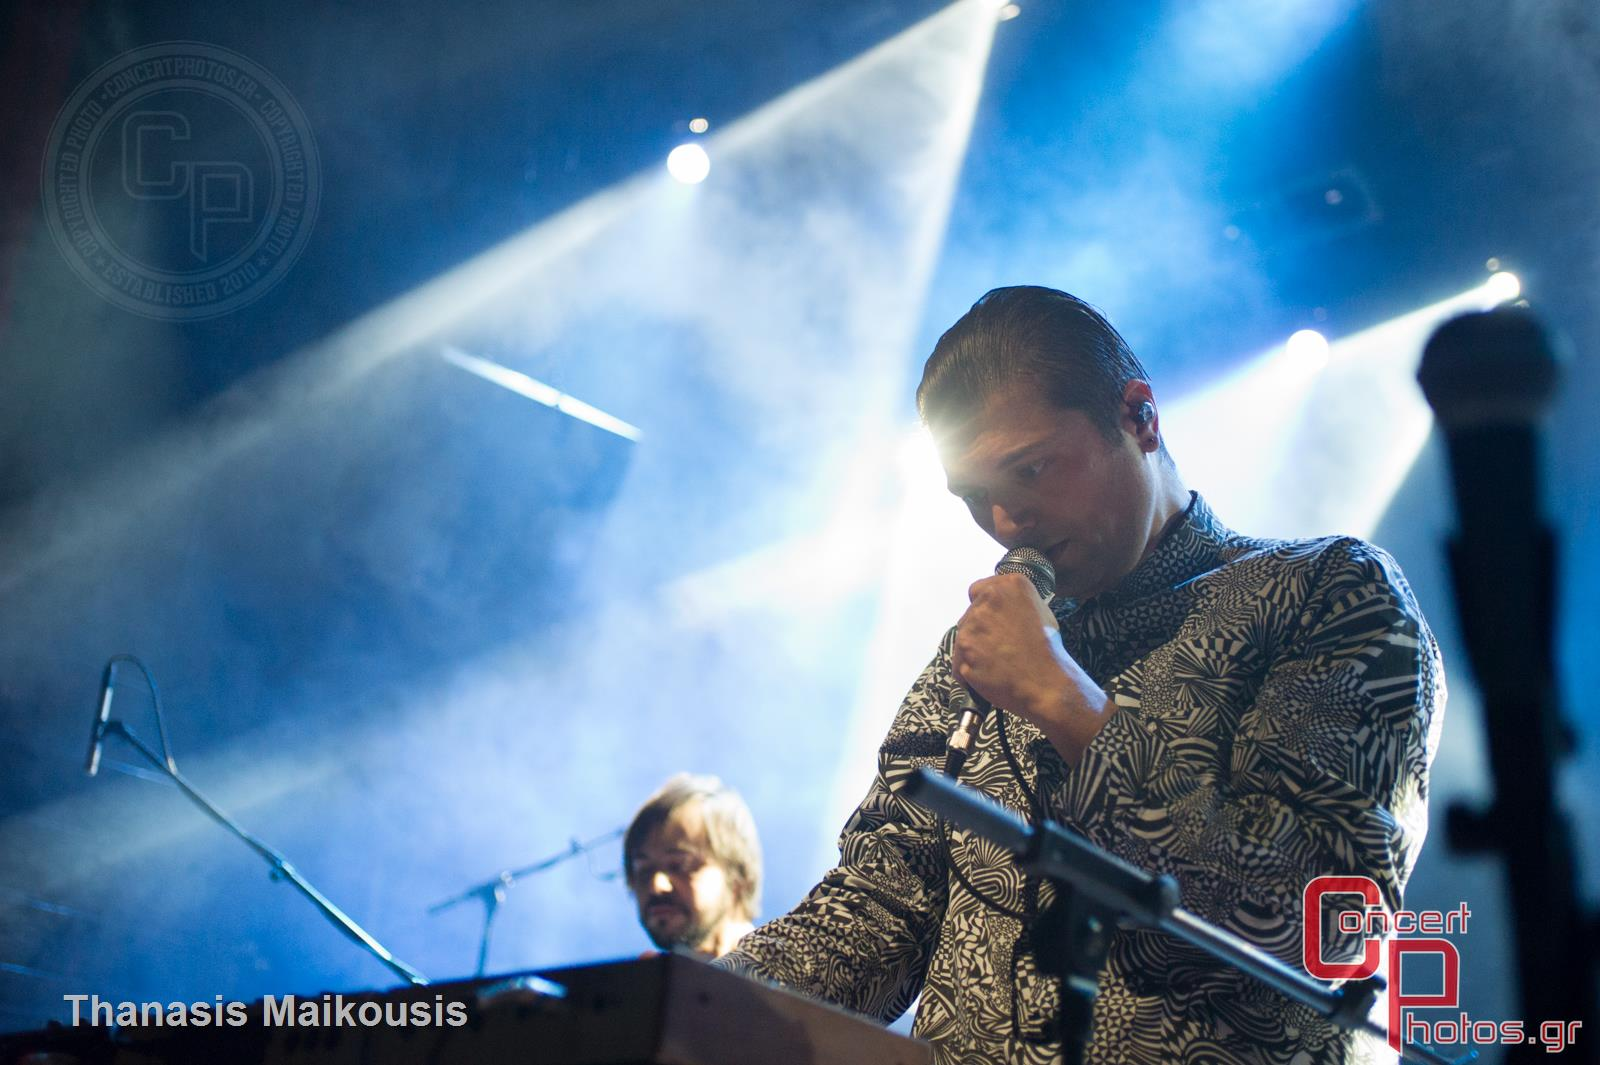 Tricky - Spectralfire-Tricky - Spectralfire photographer: Thanasis Maikousis - concertphotos_-3571